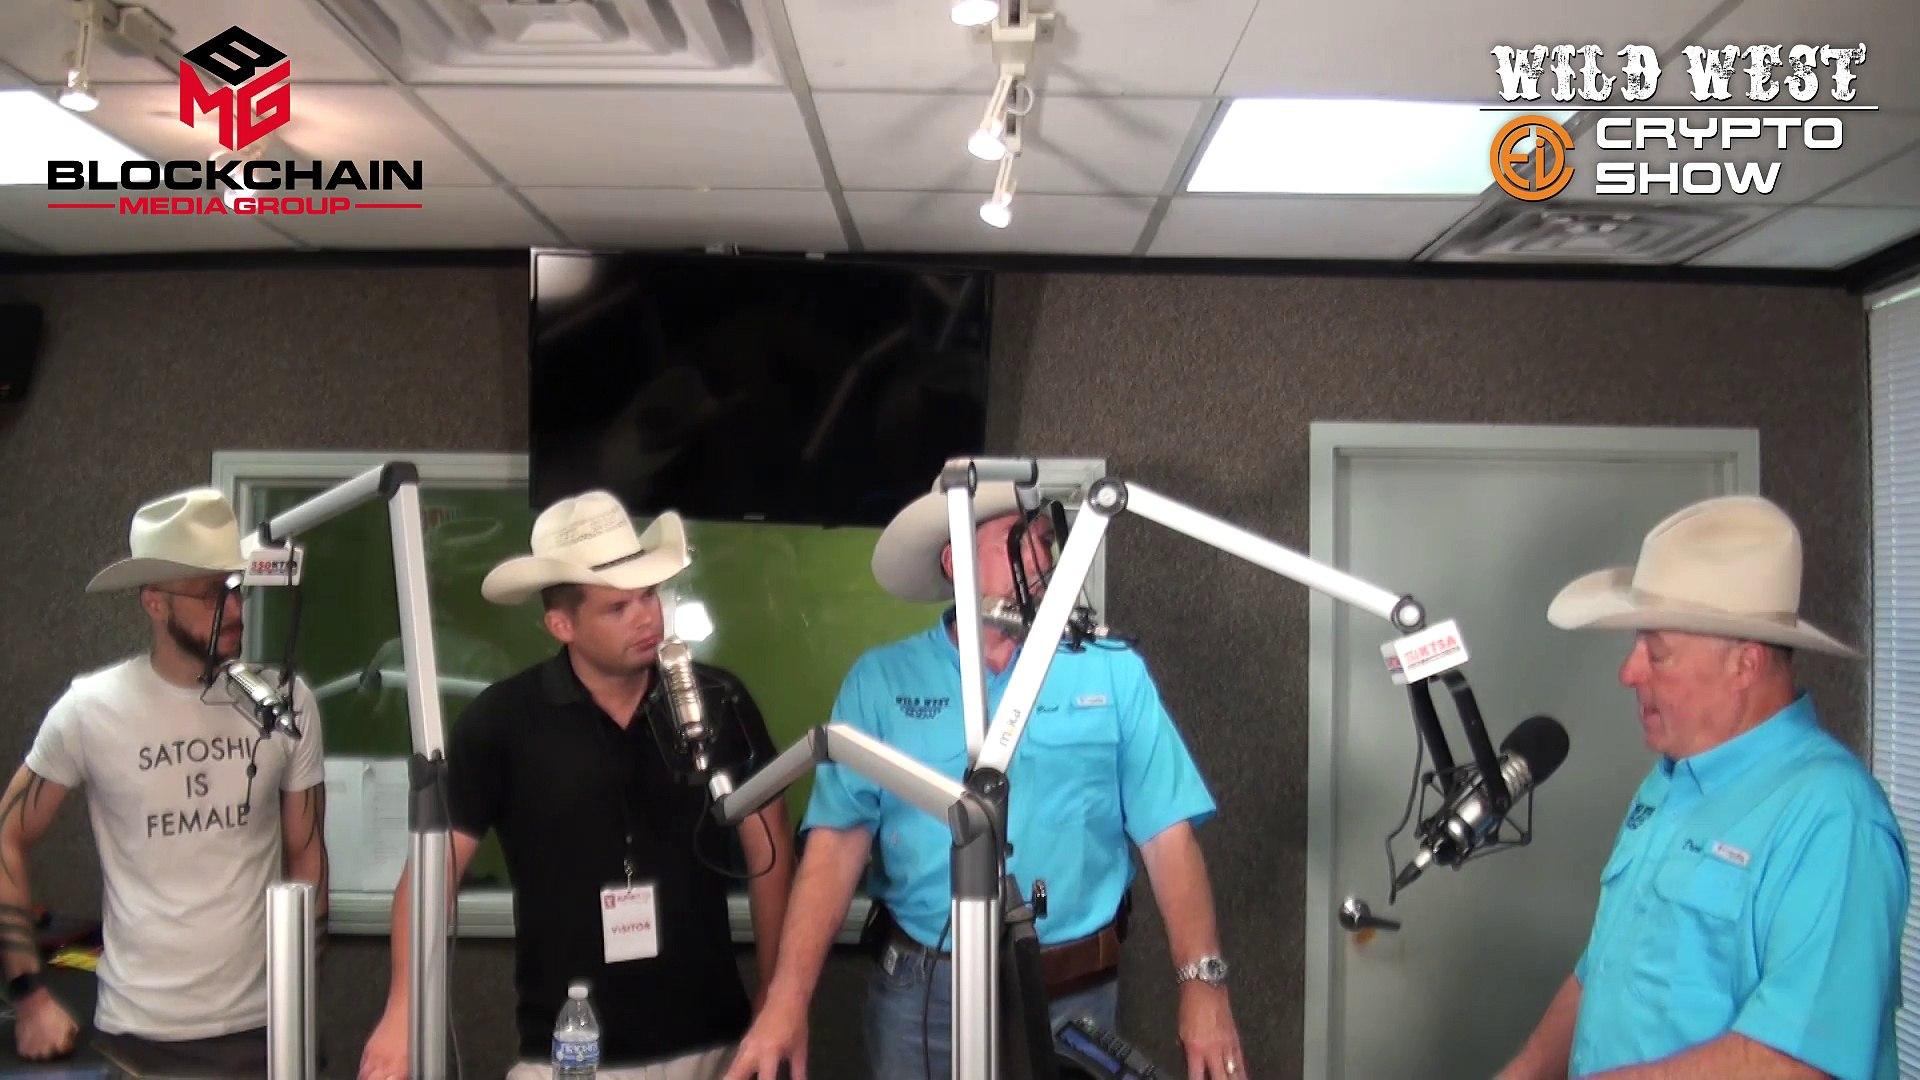 Wild West Crypto Show Episode #25 Crypto Dinosaurs – Hour 1